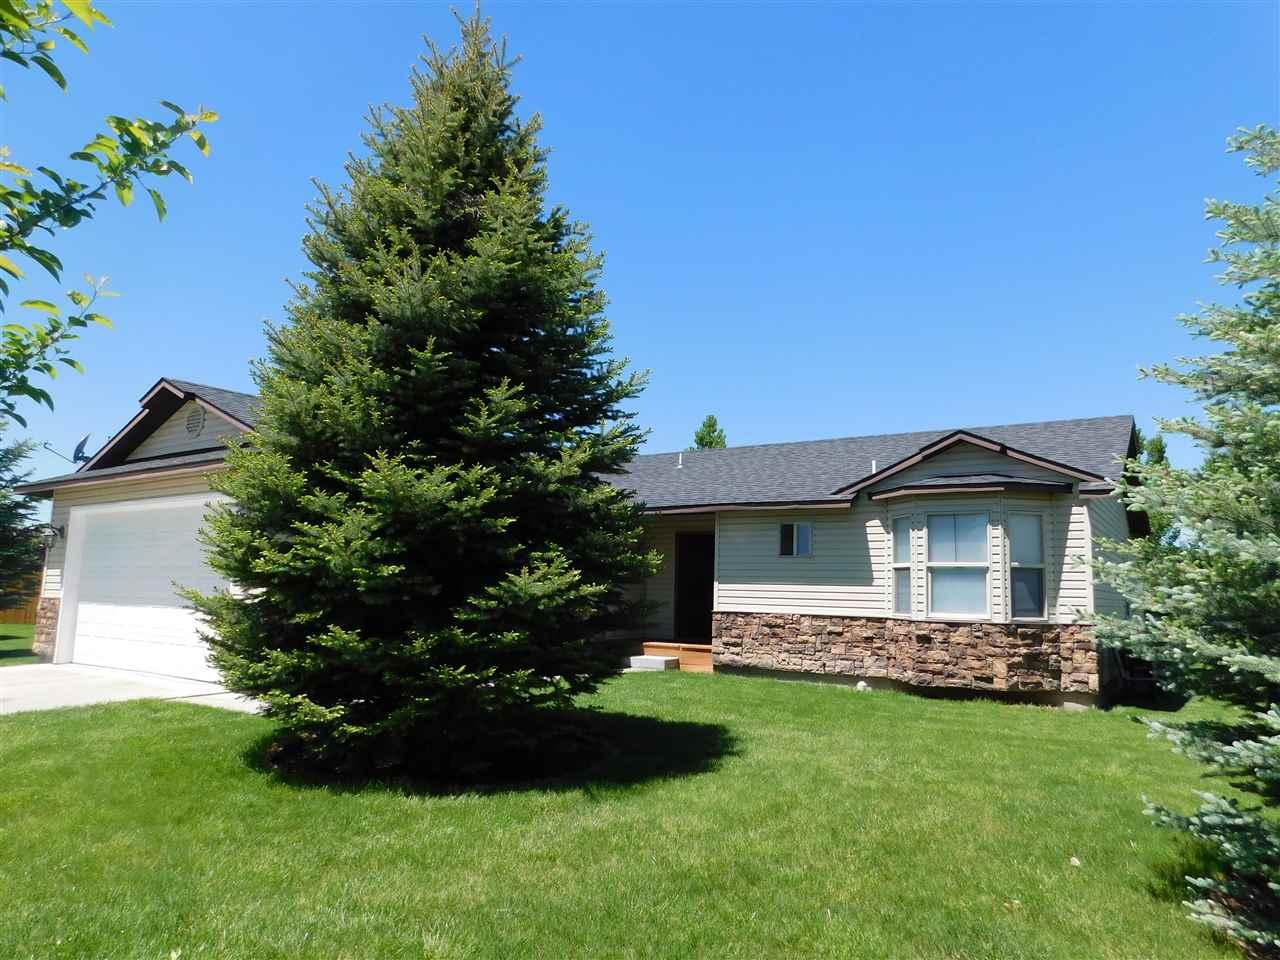 Single Family Home for Sale at 109 Horizon Place 109 Horizon Place Shoshone, Idaho 83352